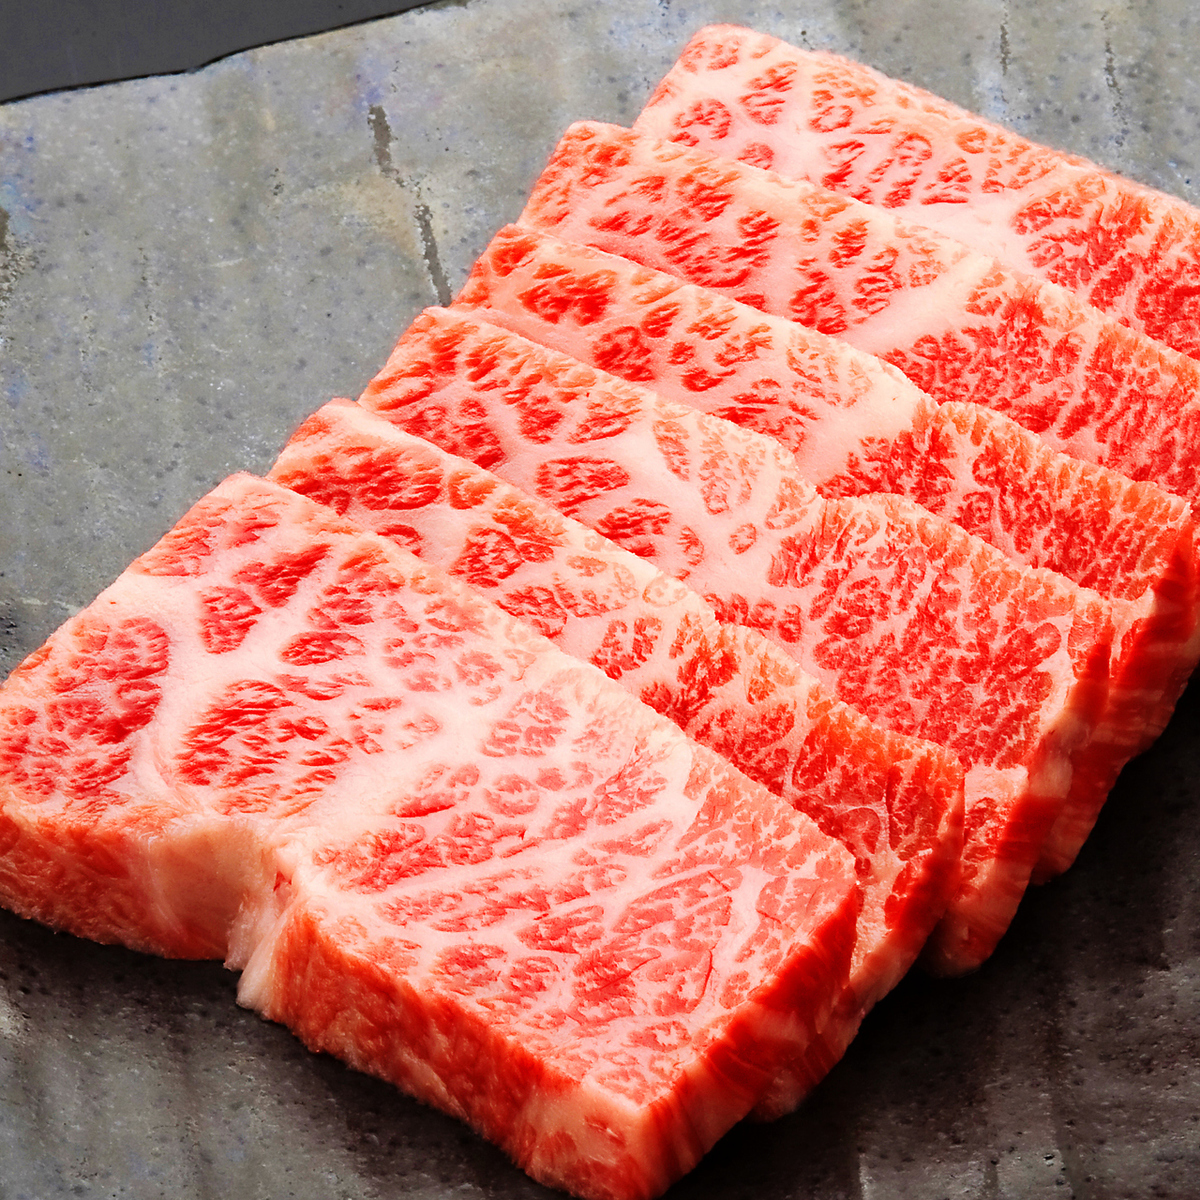 北海道十勝産黒毛和牛/カルビ